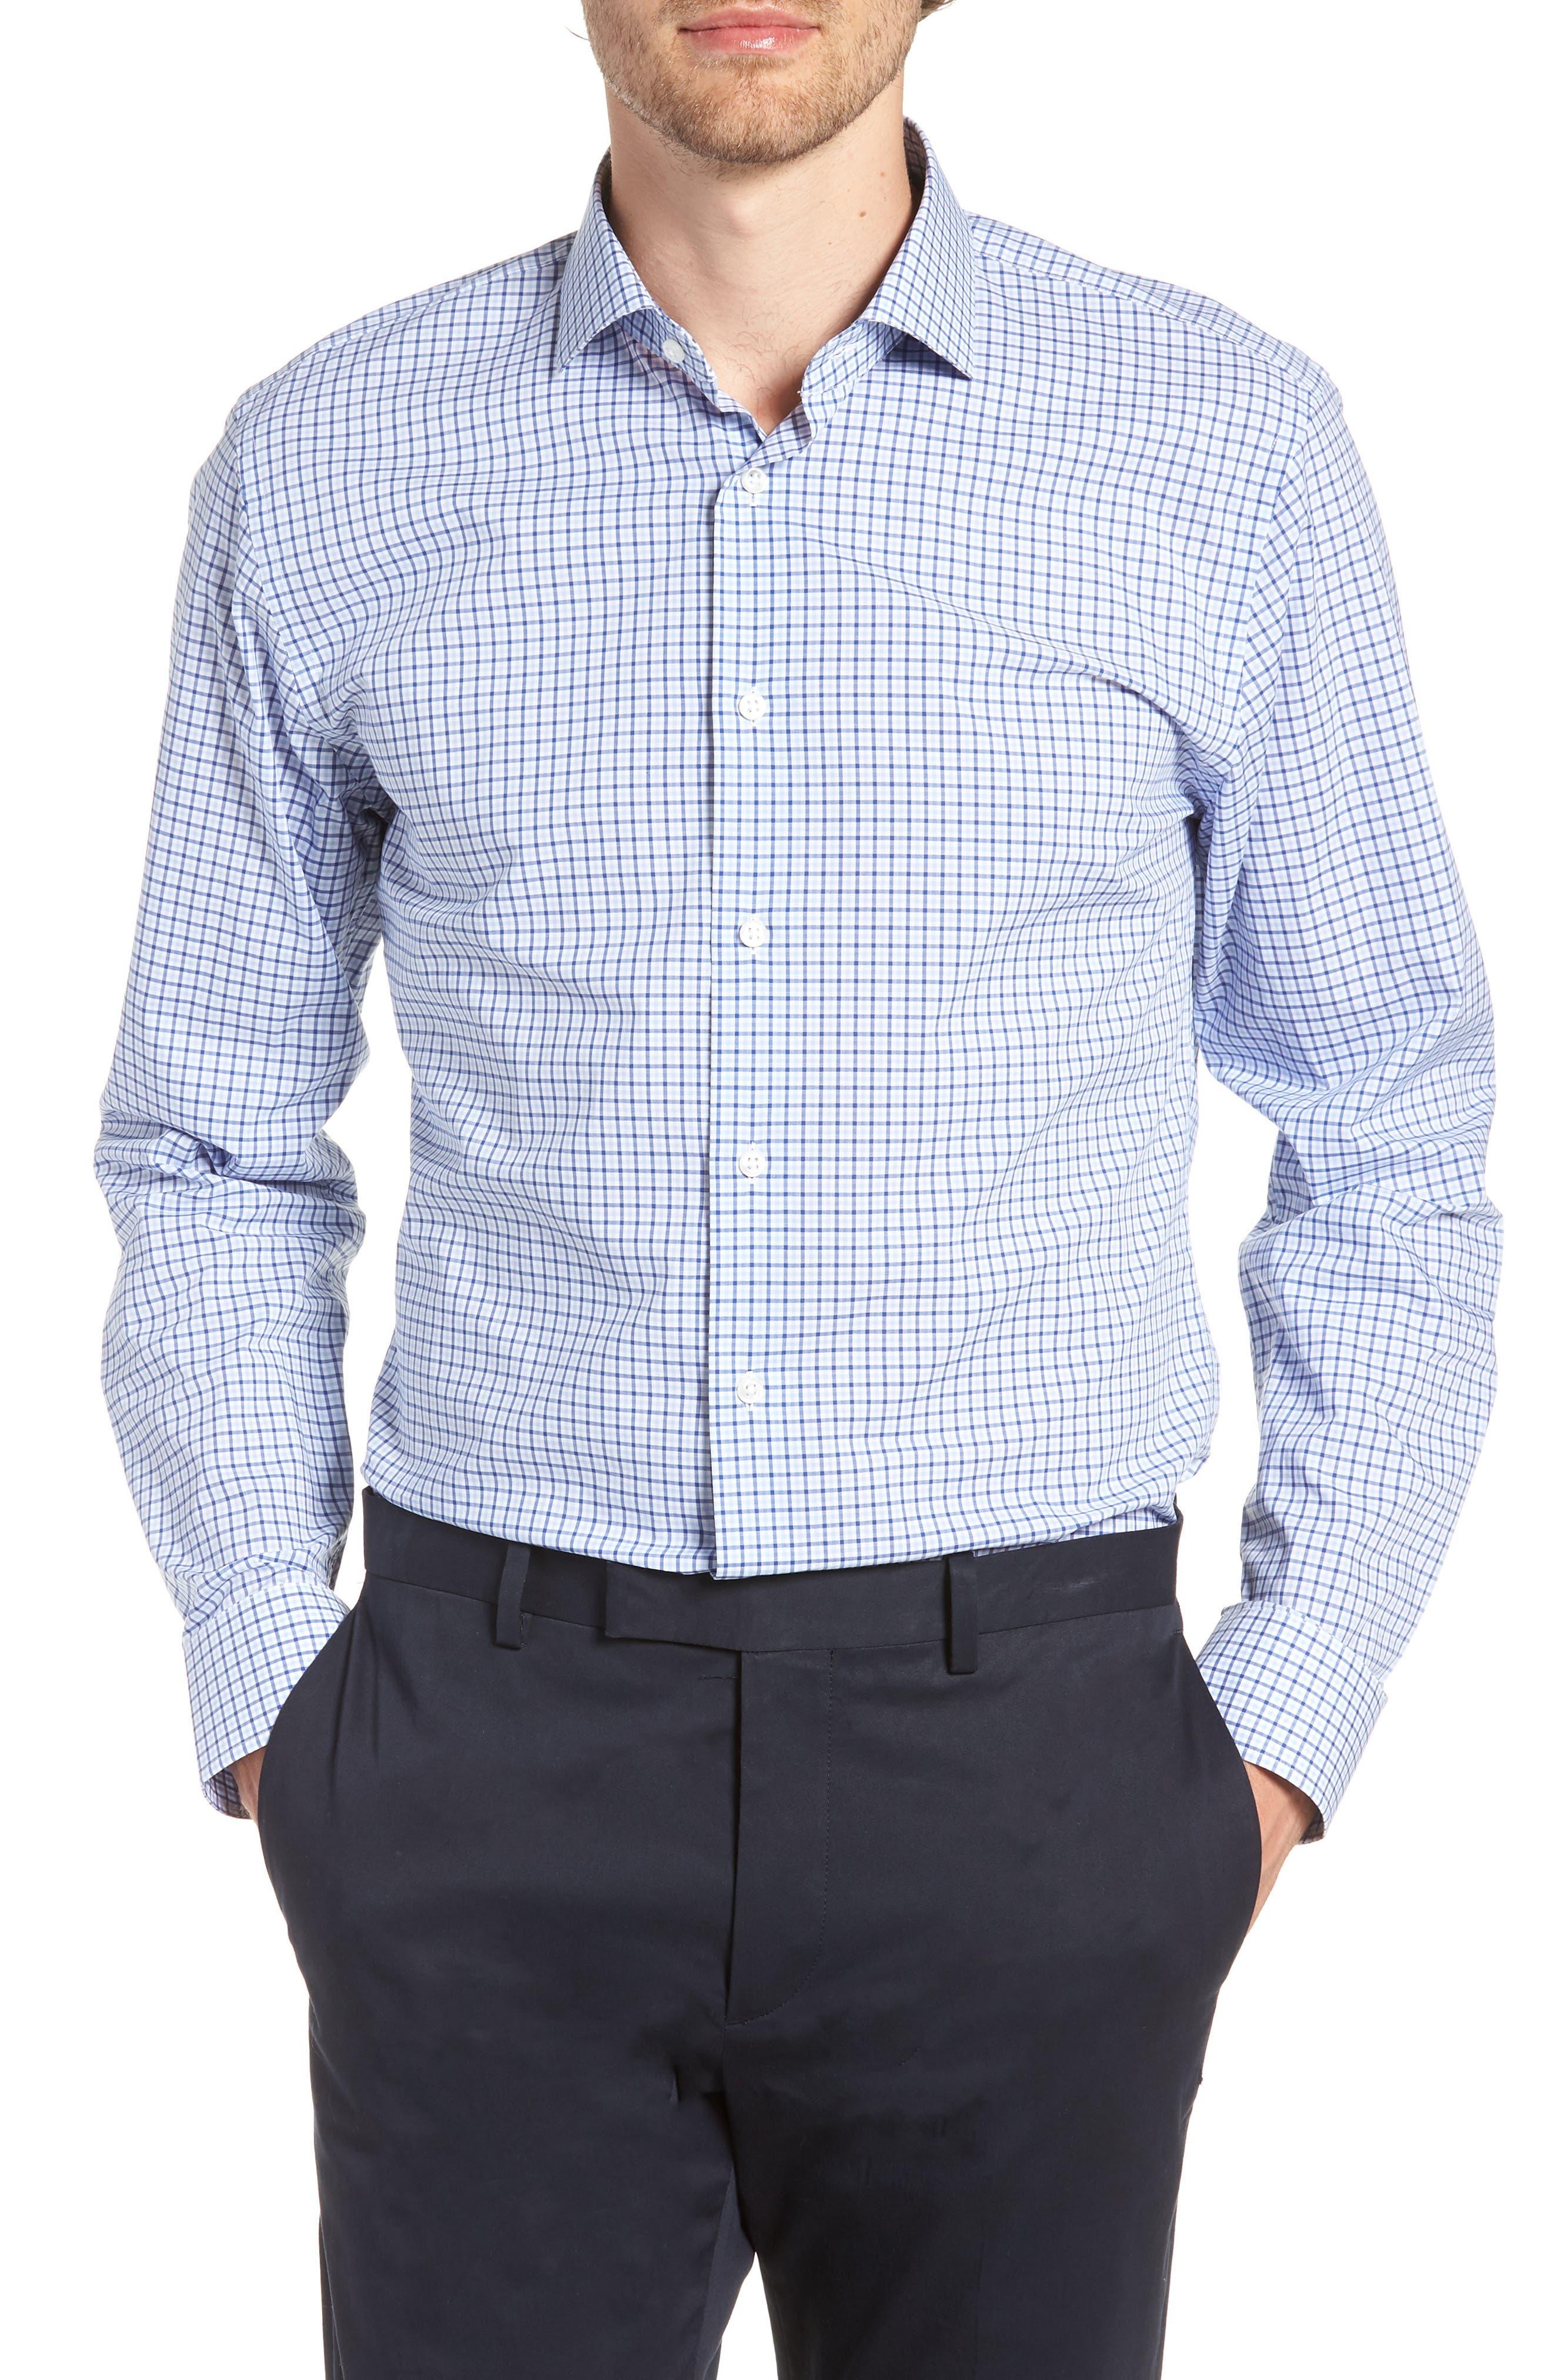 Trim Fit Check Dress Shirt,                             Main thumbnail 1, color,                             BLUE SODALITE